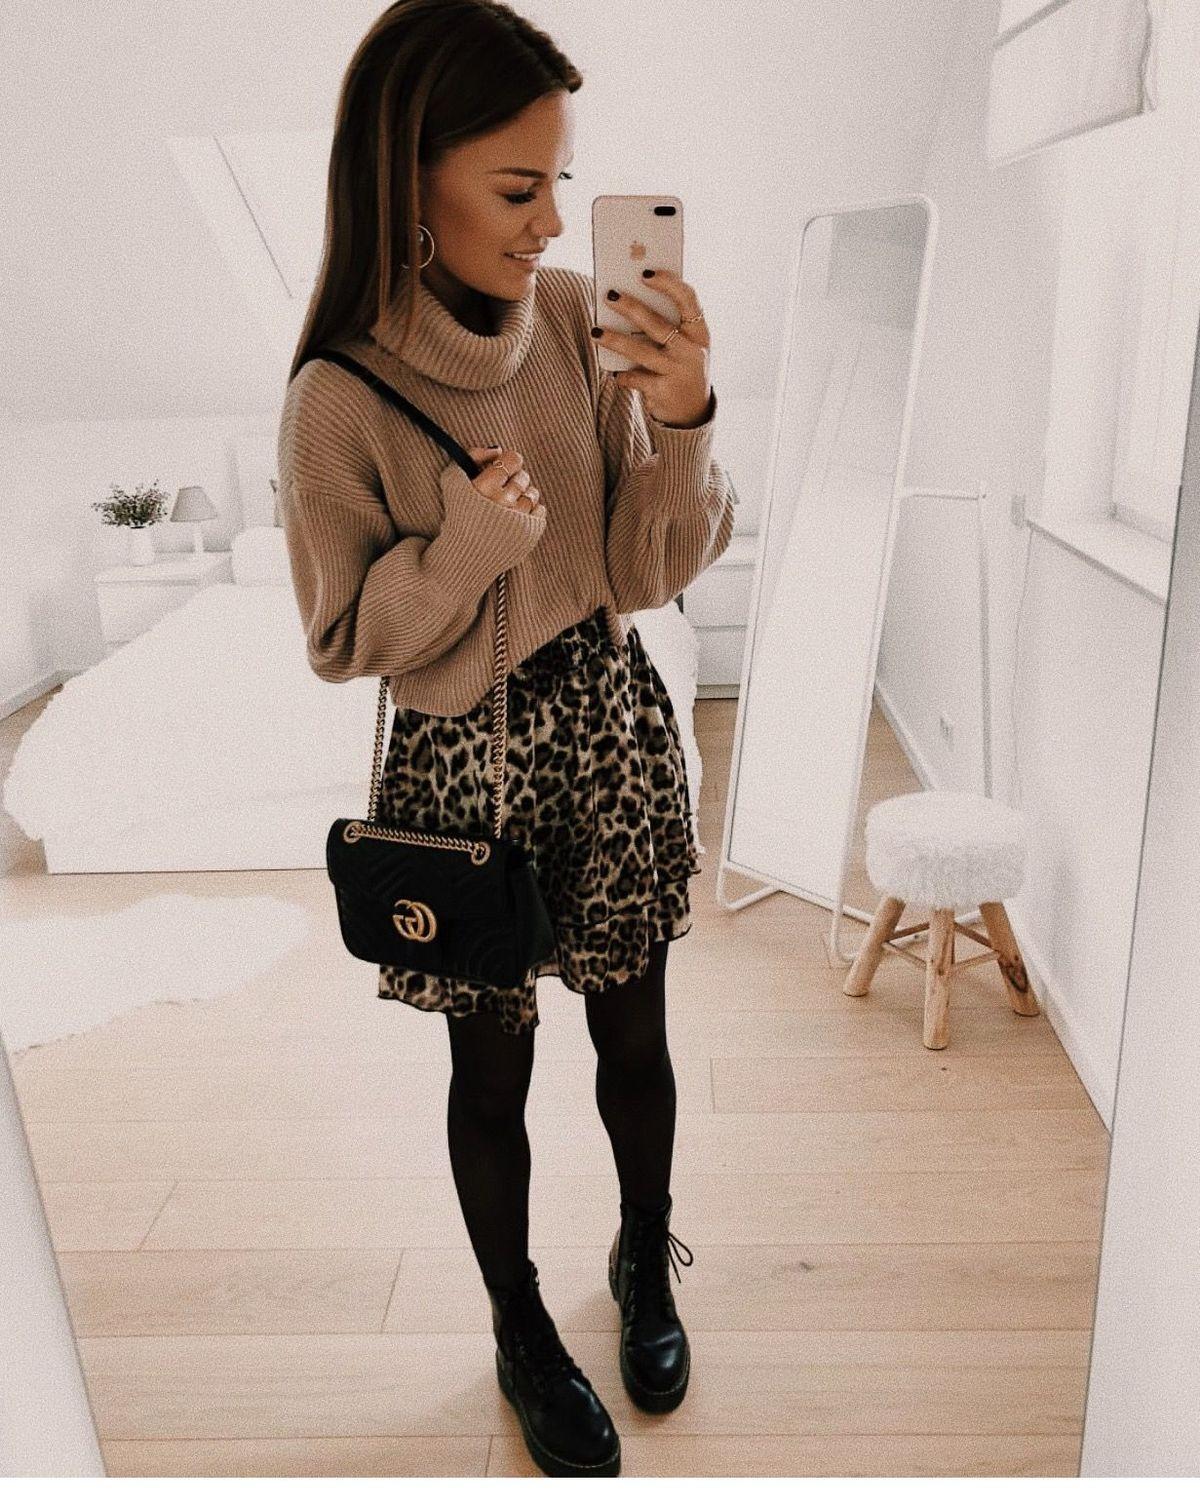 Light brown sweater, animal print skirt